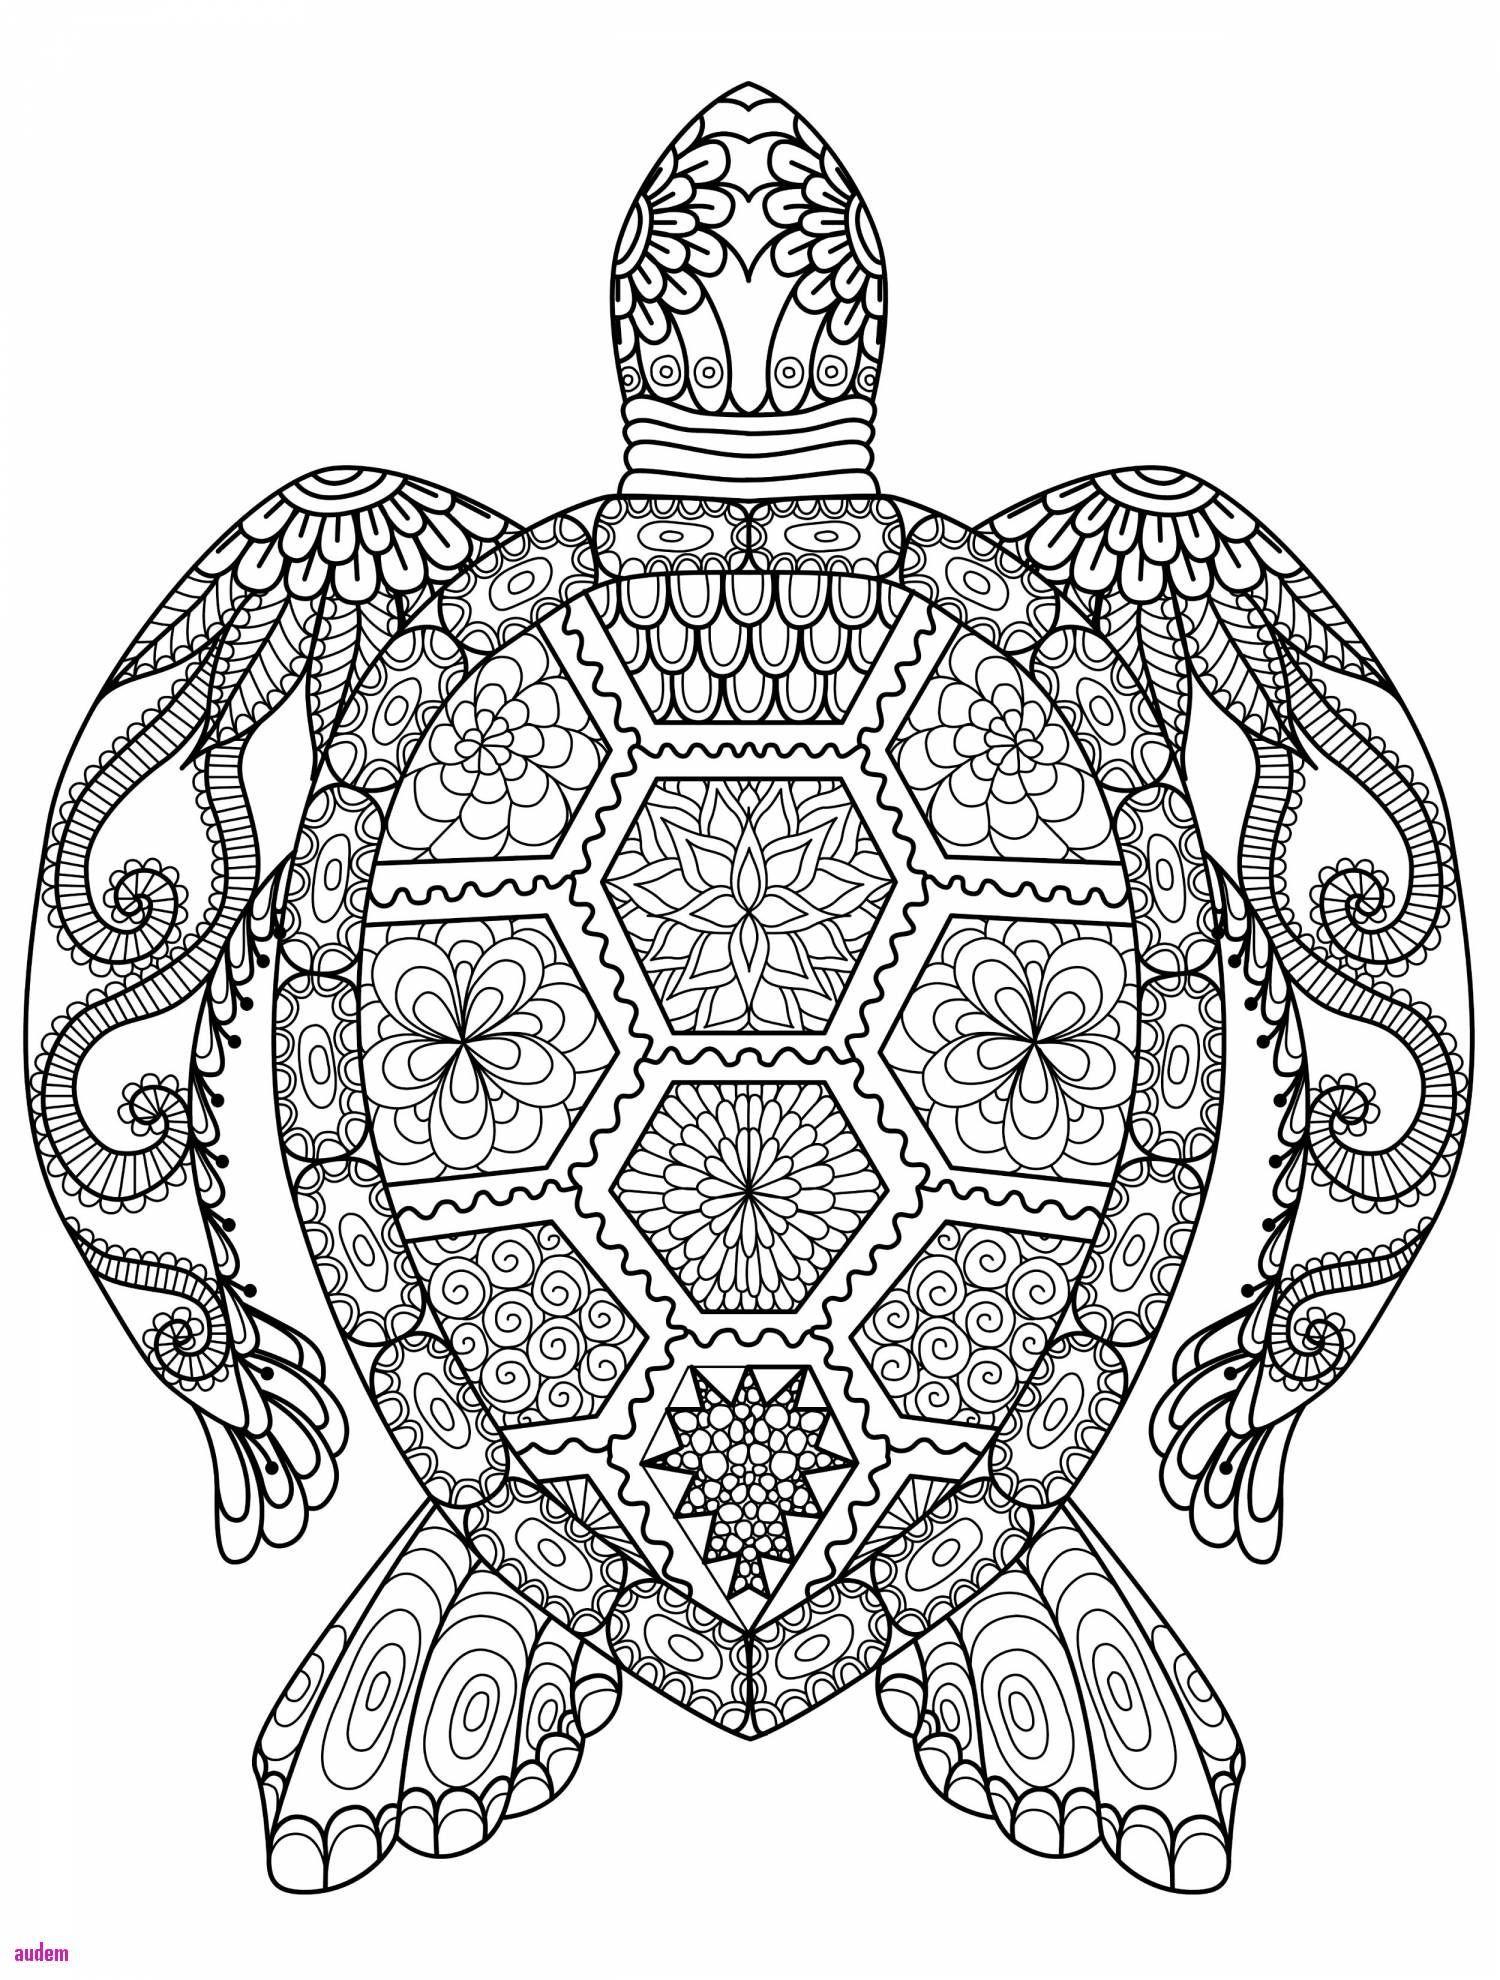 Mandala Tiere Malvorlagen  Ausmalbilder, Mandala tiere